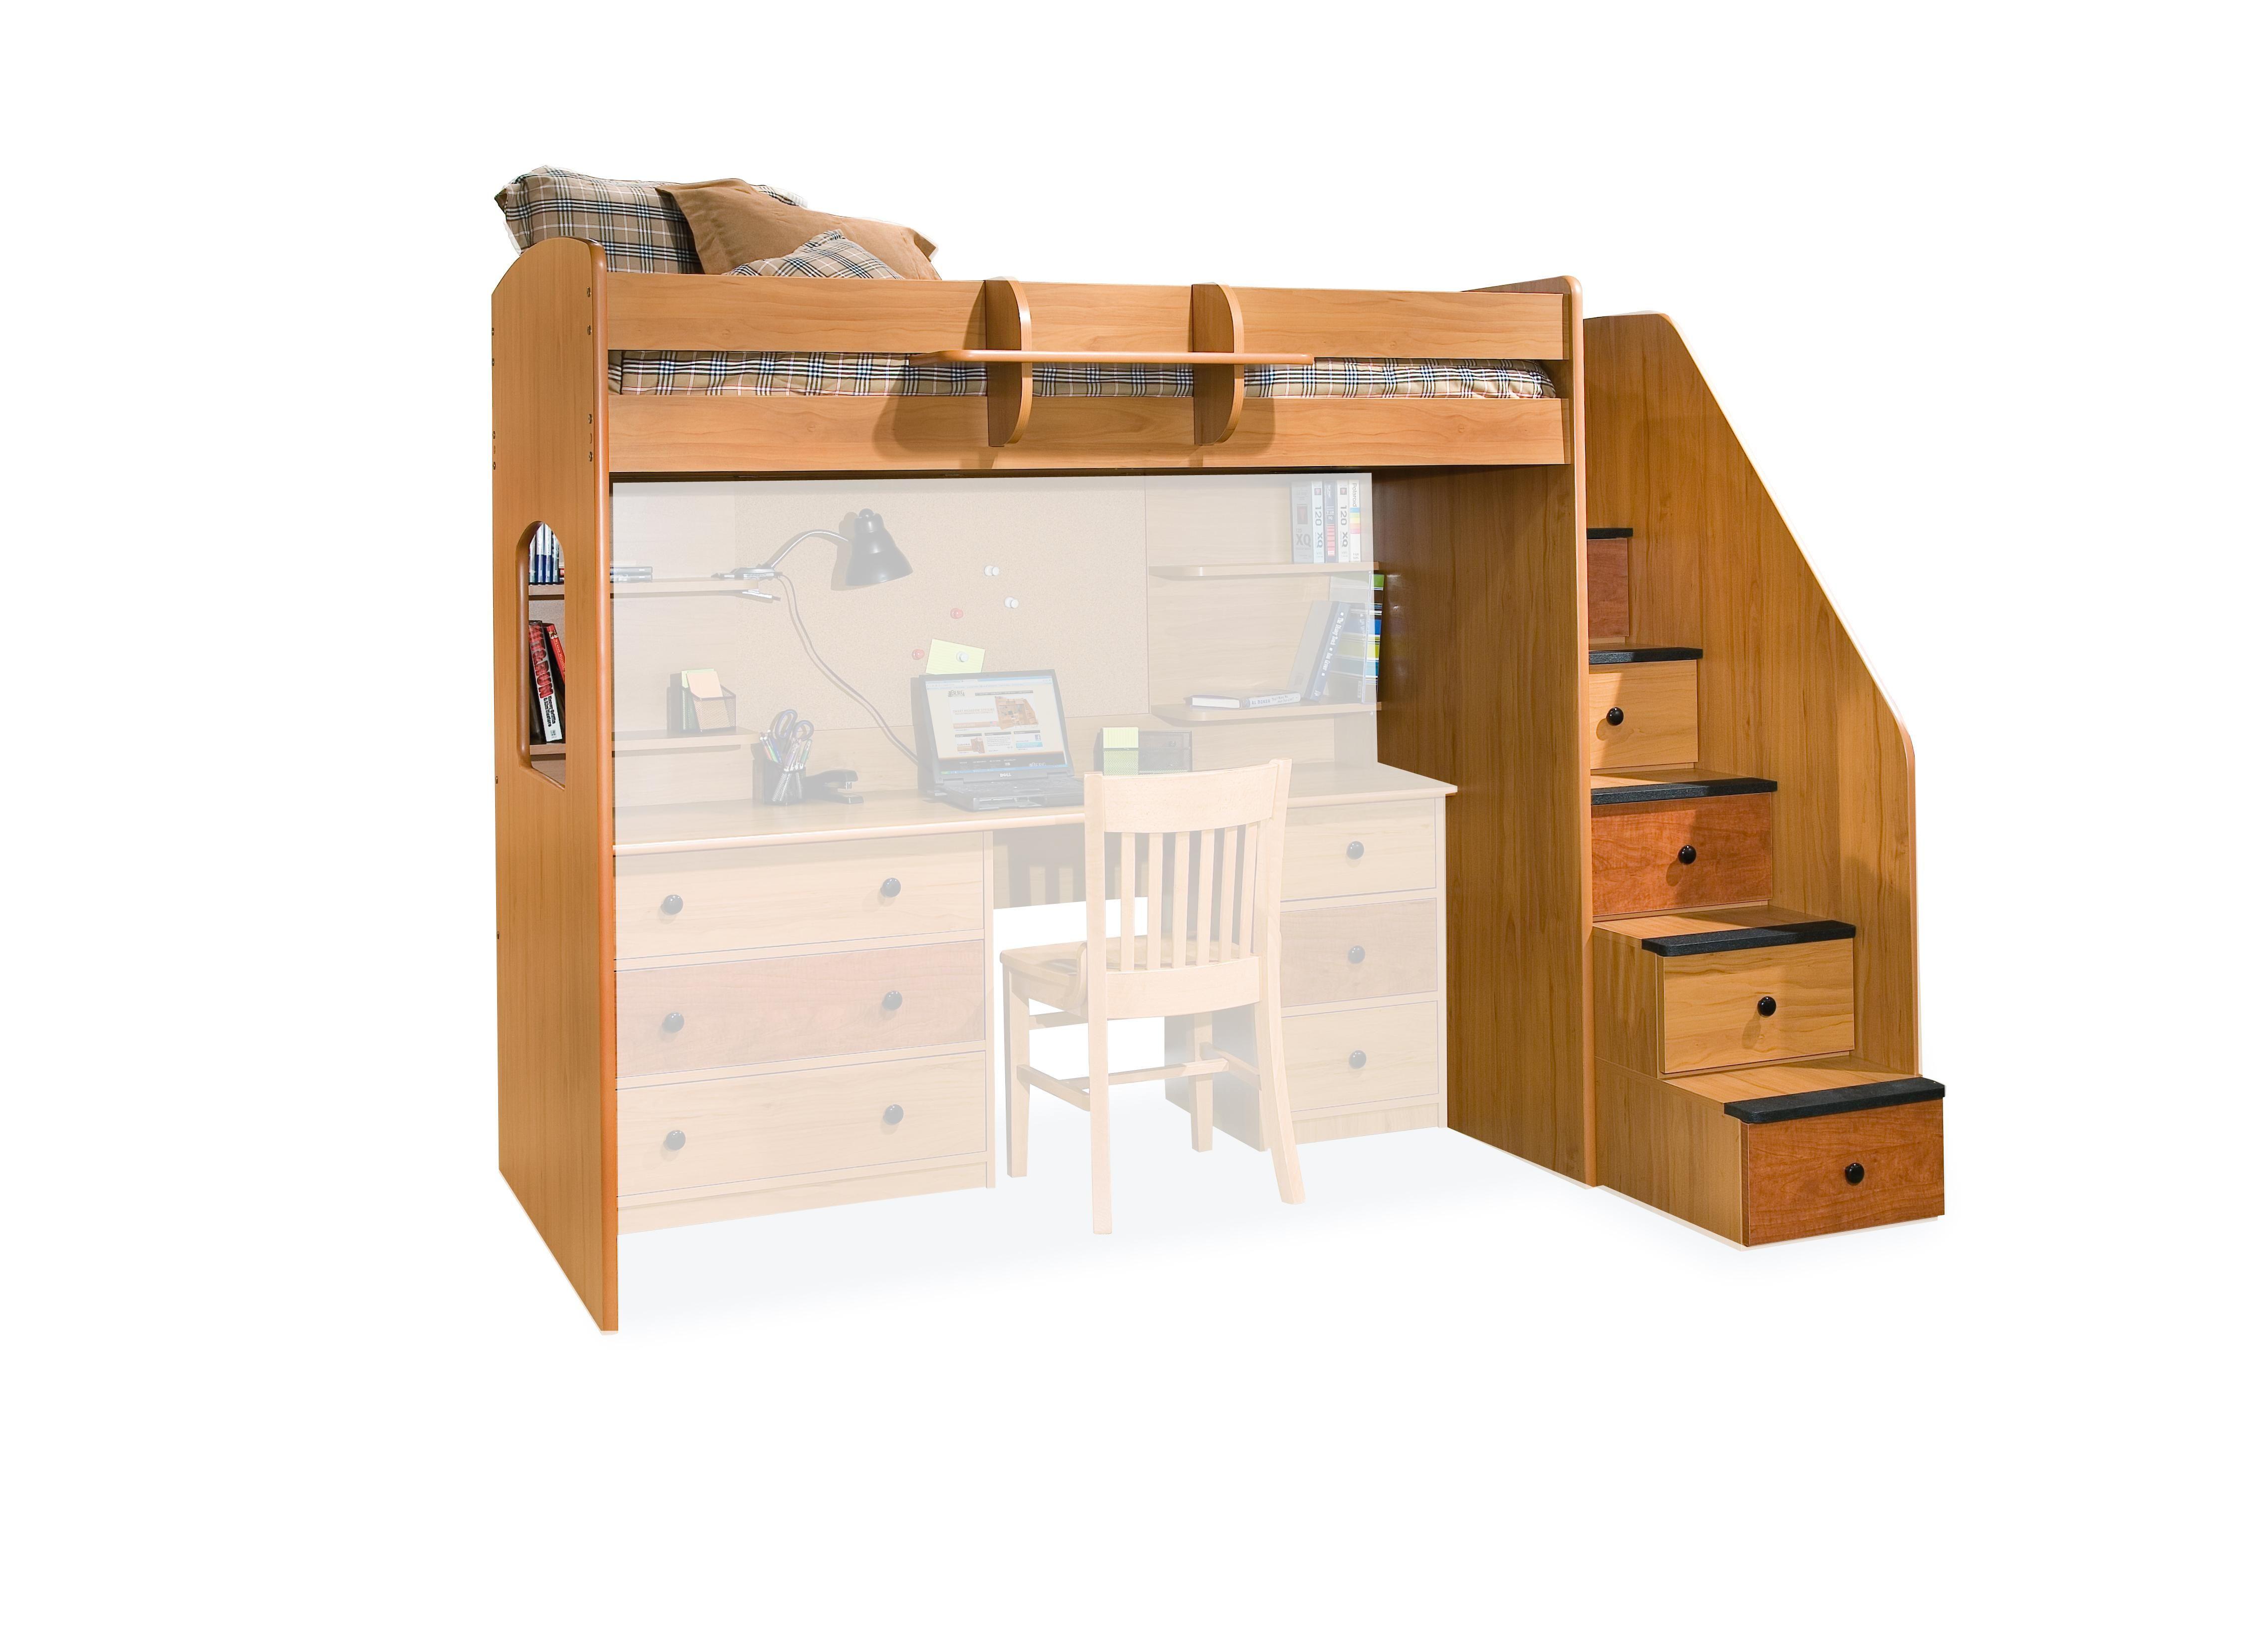 Dorm Mattress Part 4 Loft Bed With Stairs kid stuff